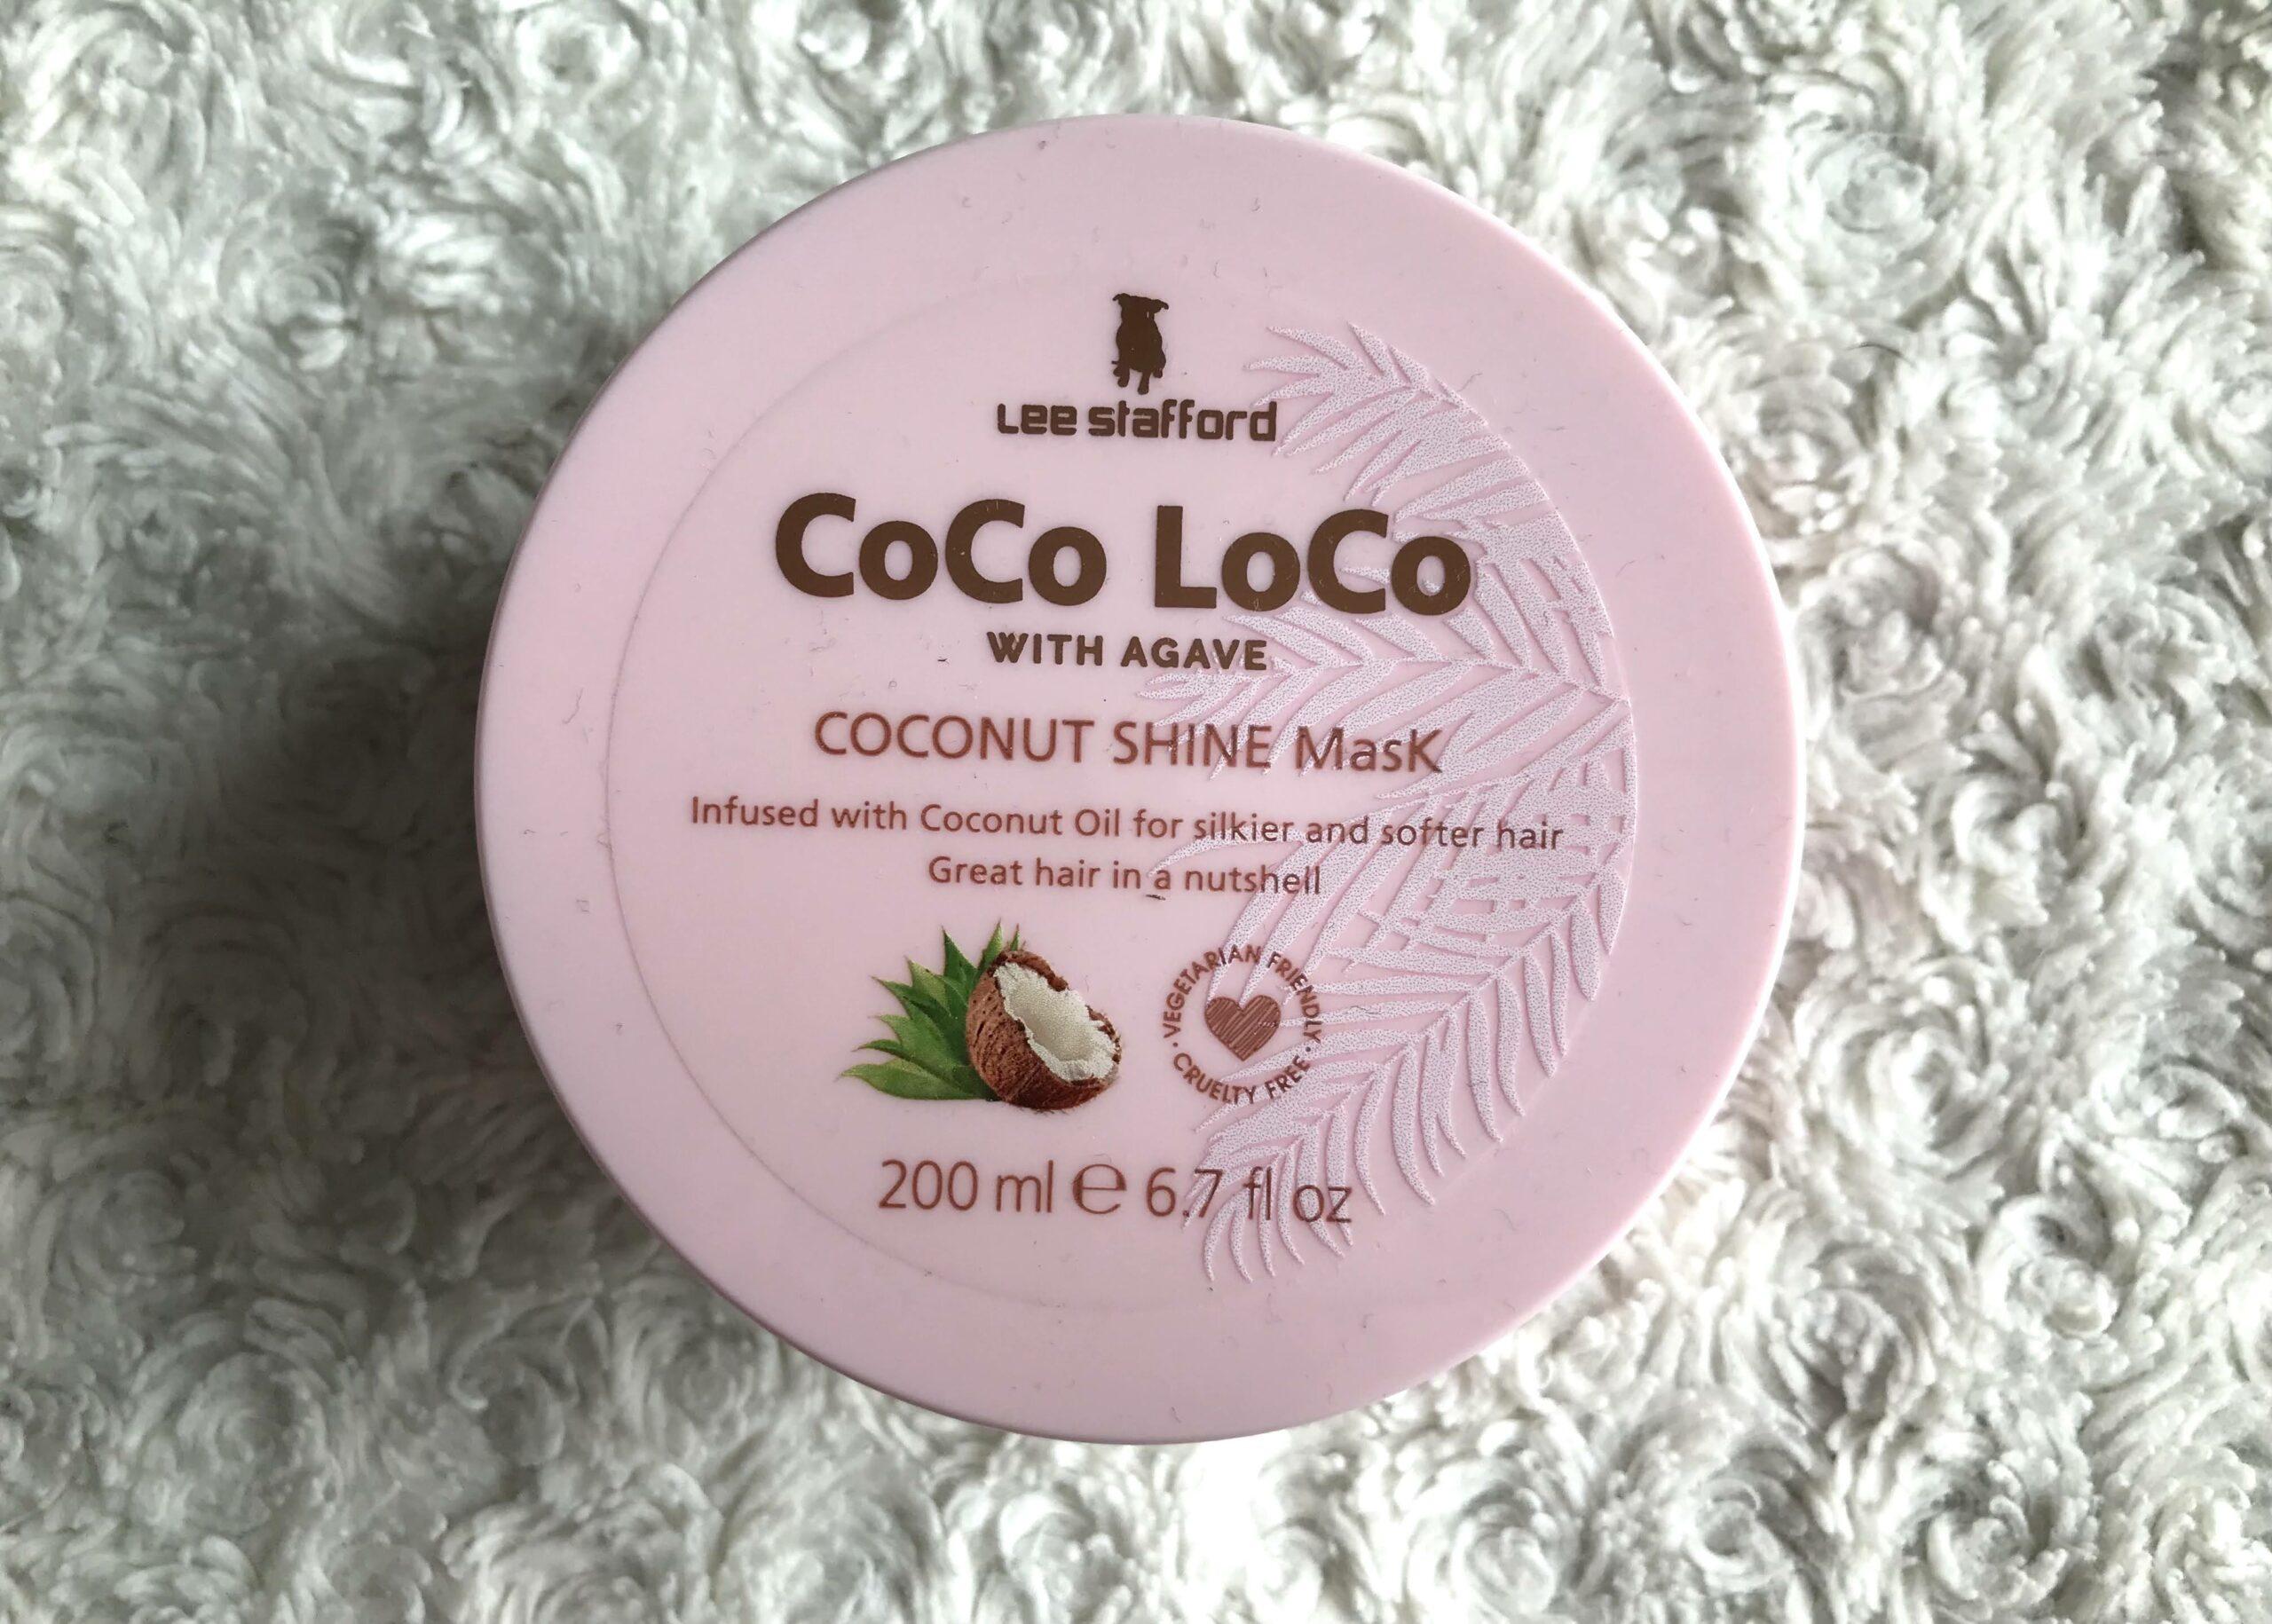 lee stafford coco loco coconut mask